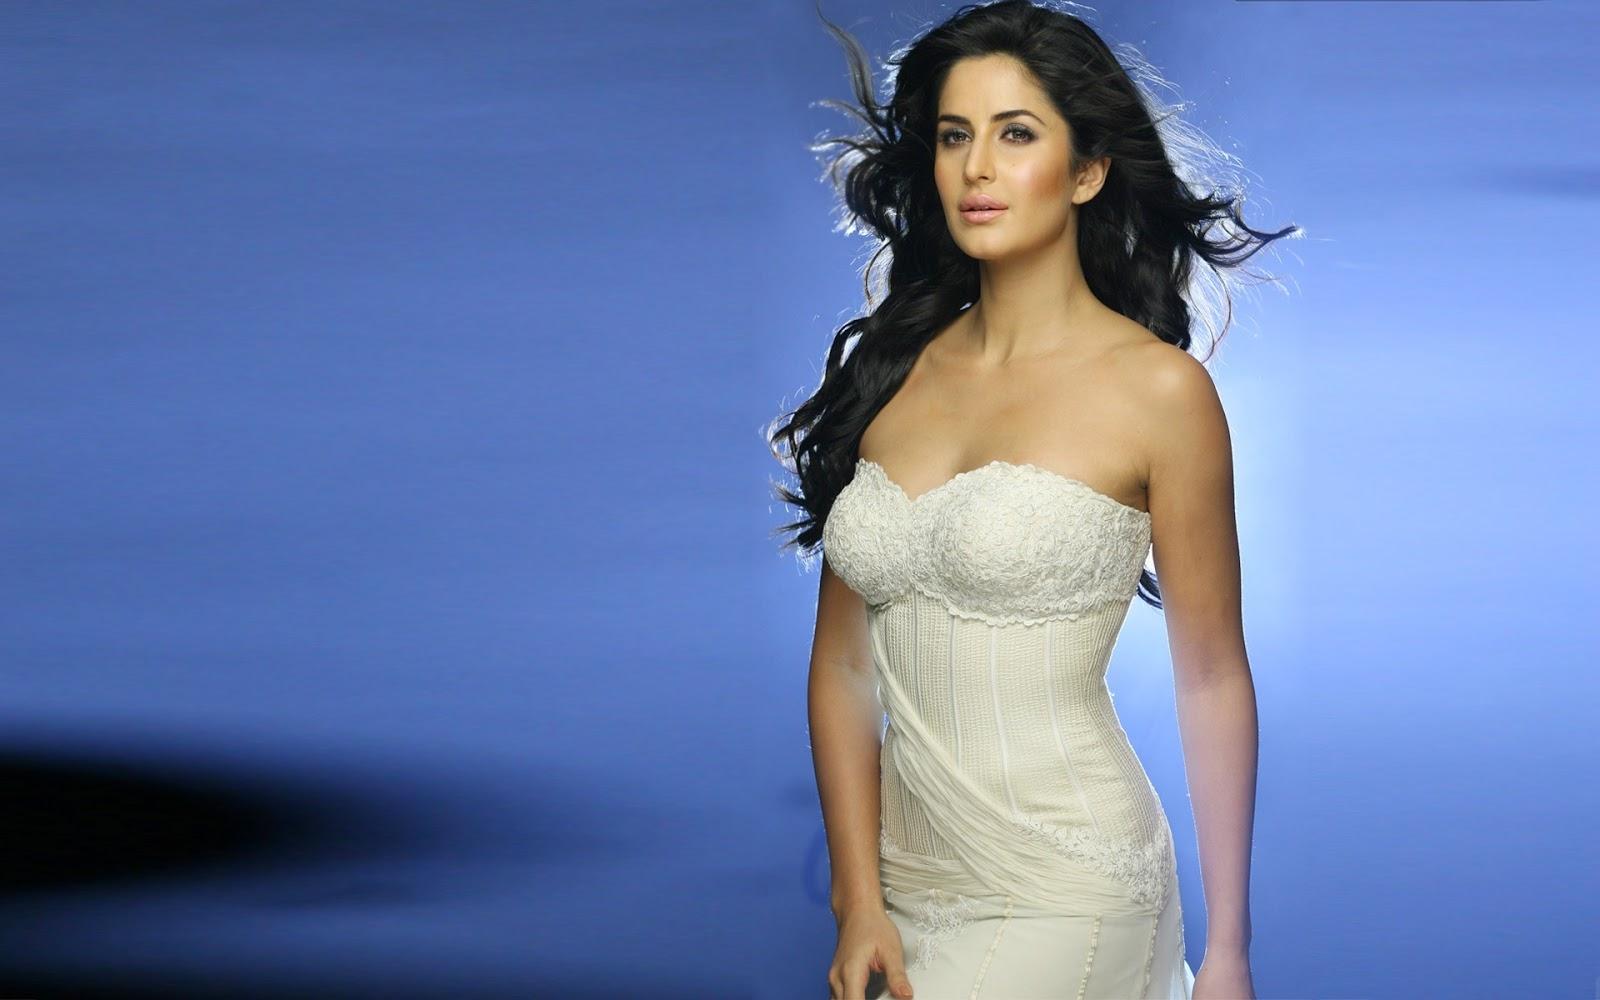 51 Top Hd Wallpaper Sauth Indian Actress Hd Wallpaper-5305